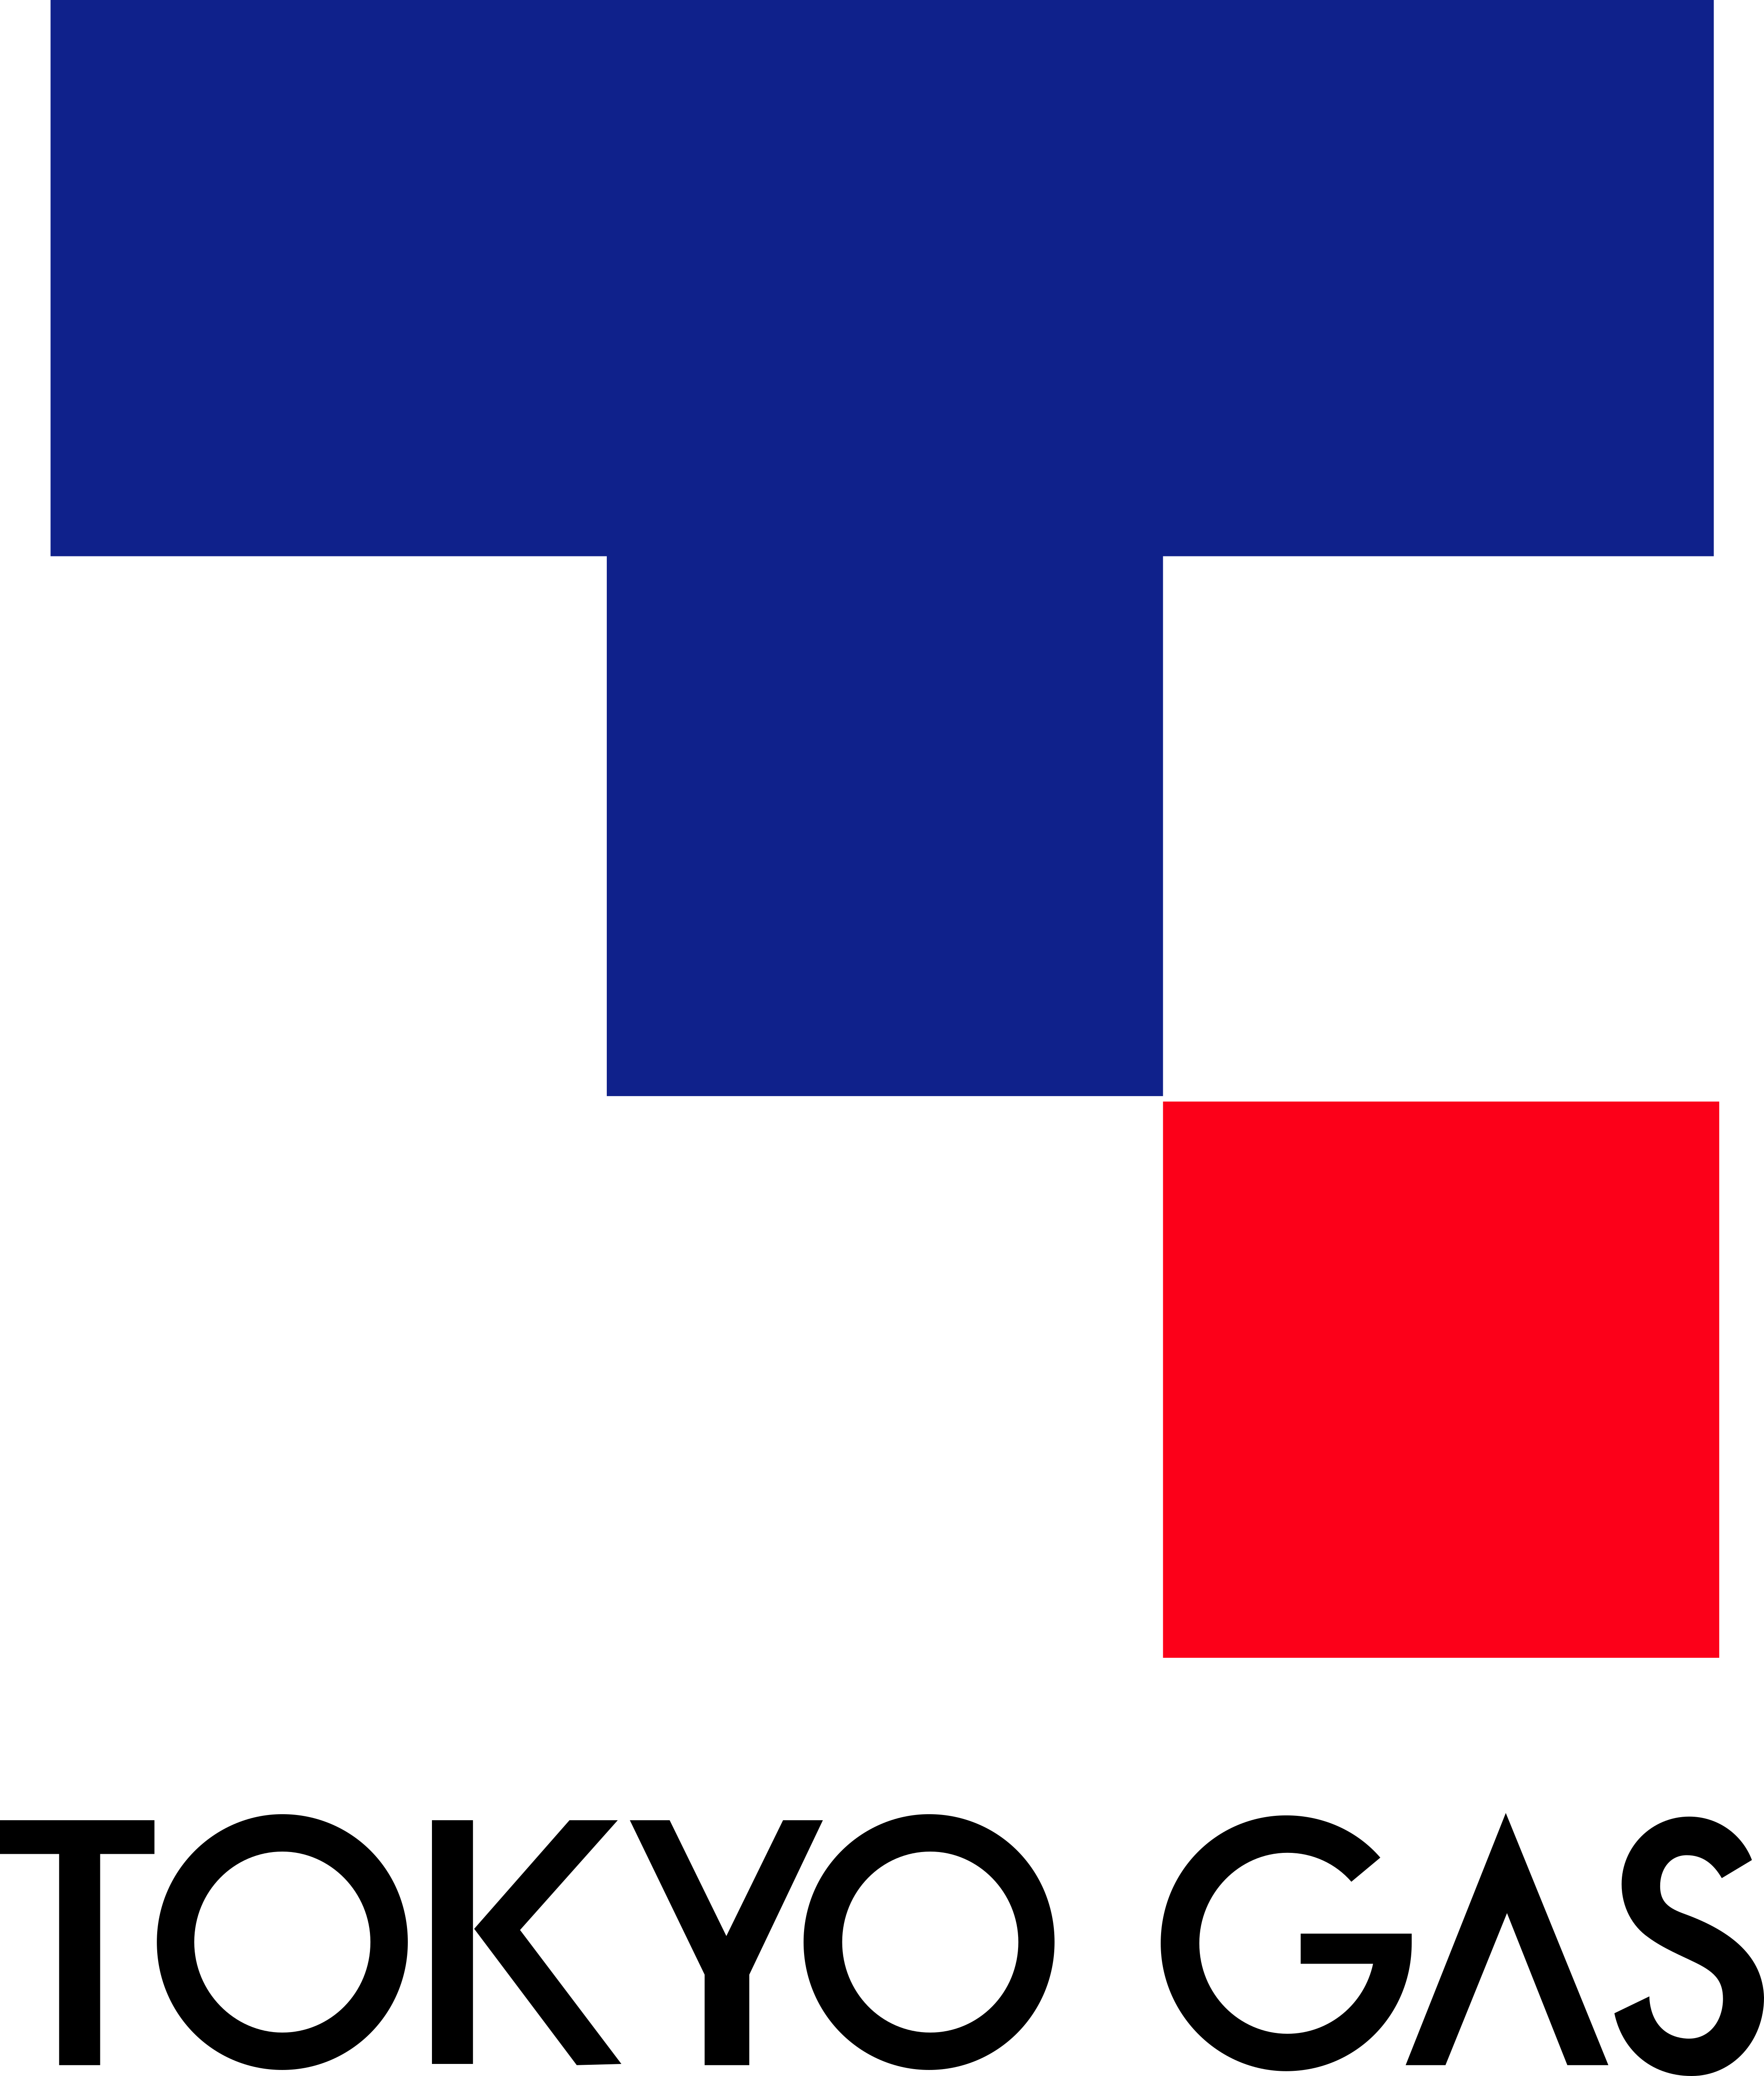 tokyo gas logo 1 - Tokyo Gas Logo